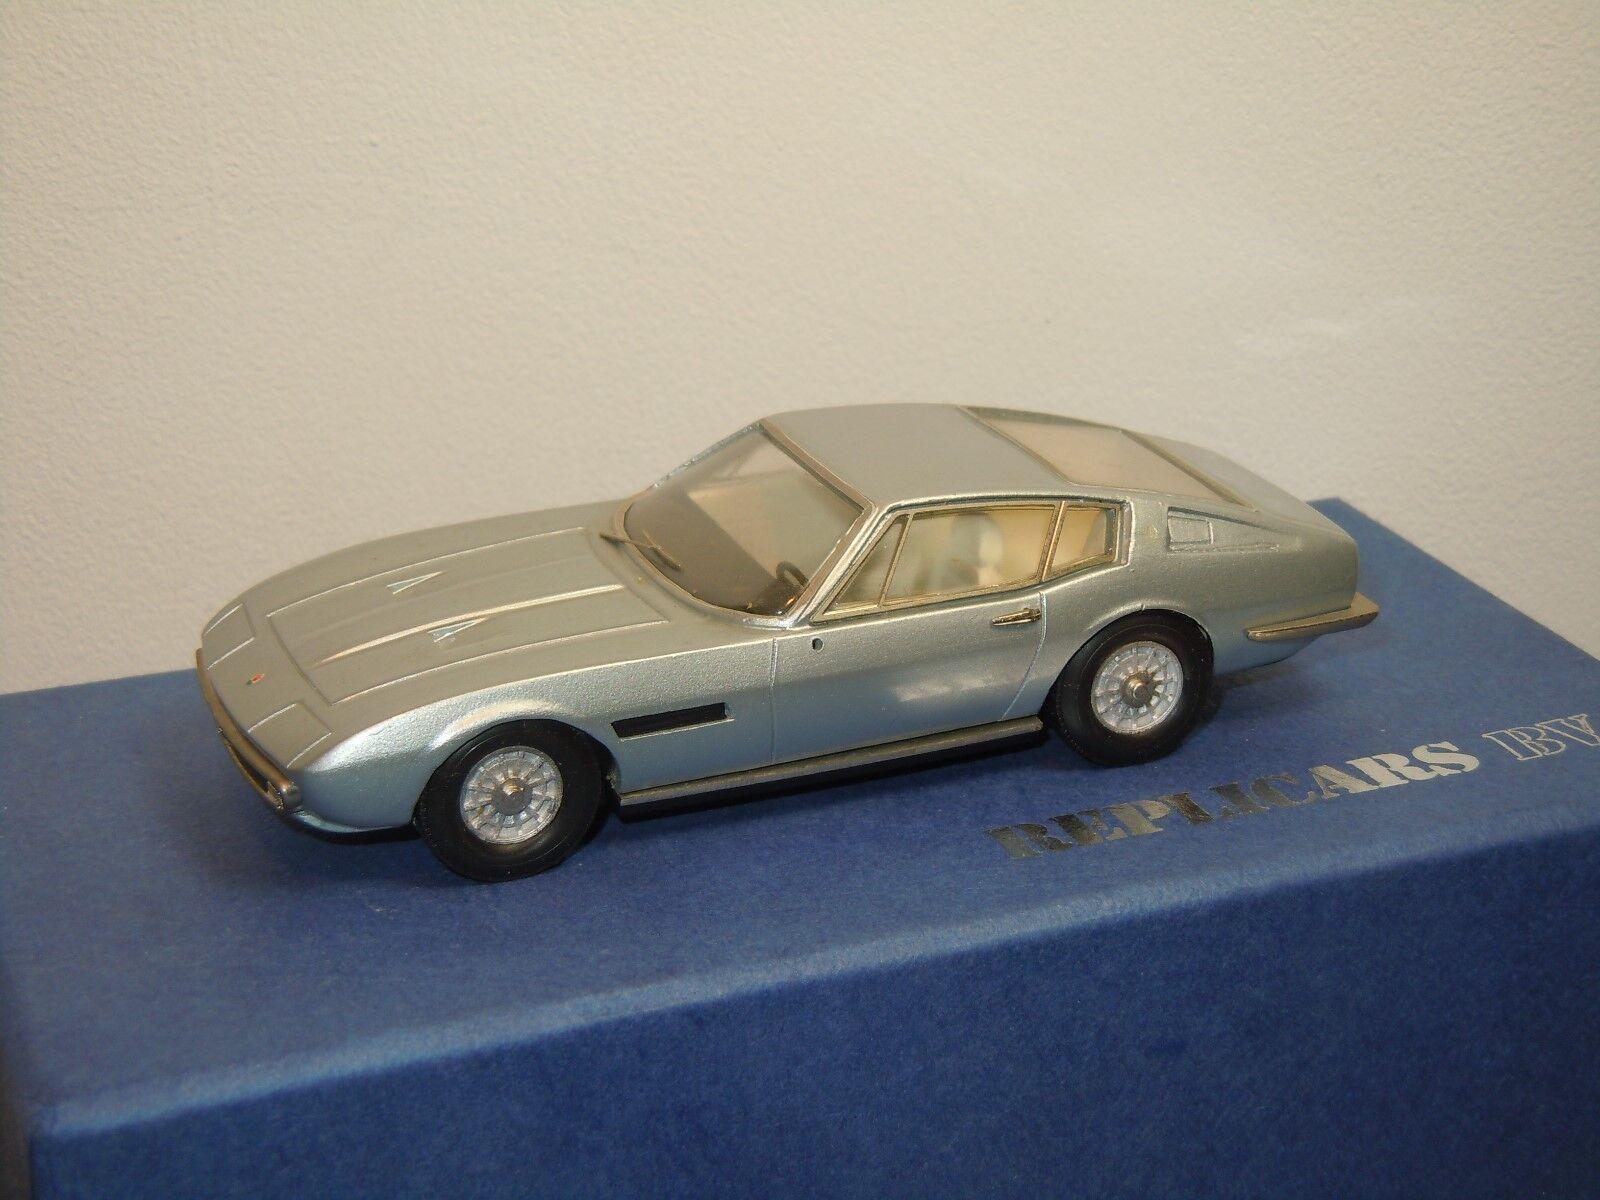 Maserati Ghibli Coupe - SMTS Replicars 1 43 in Box 35379